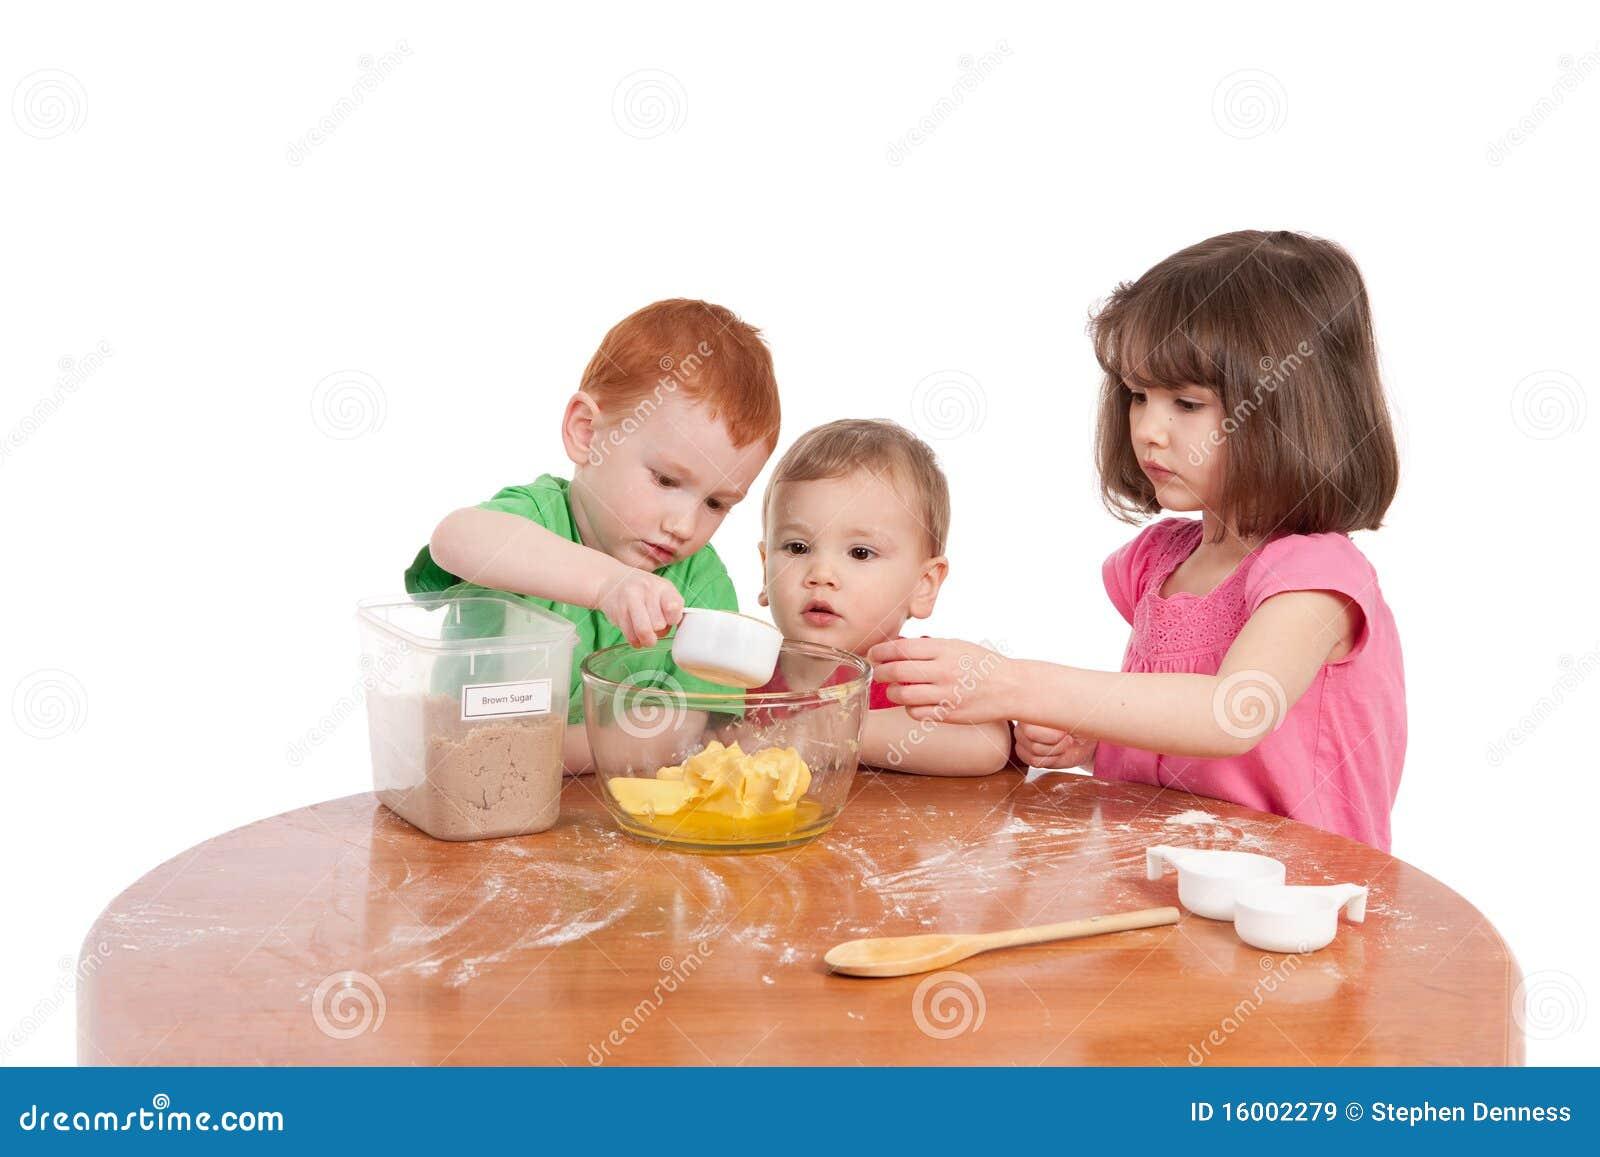 Kids Measuring Ingredients For Baking In Kitchen Royalty